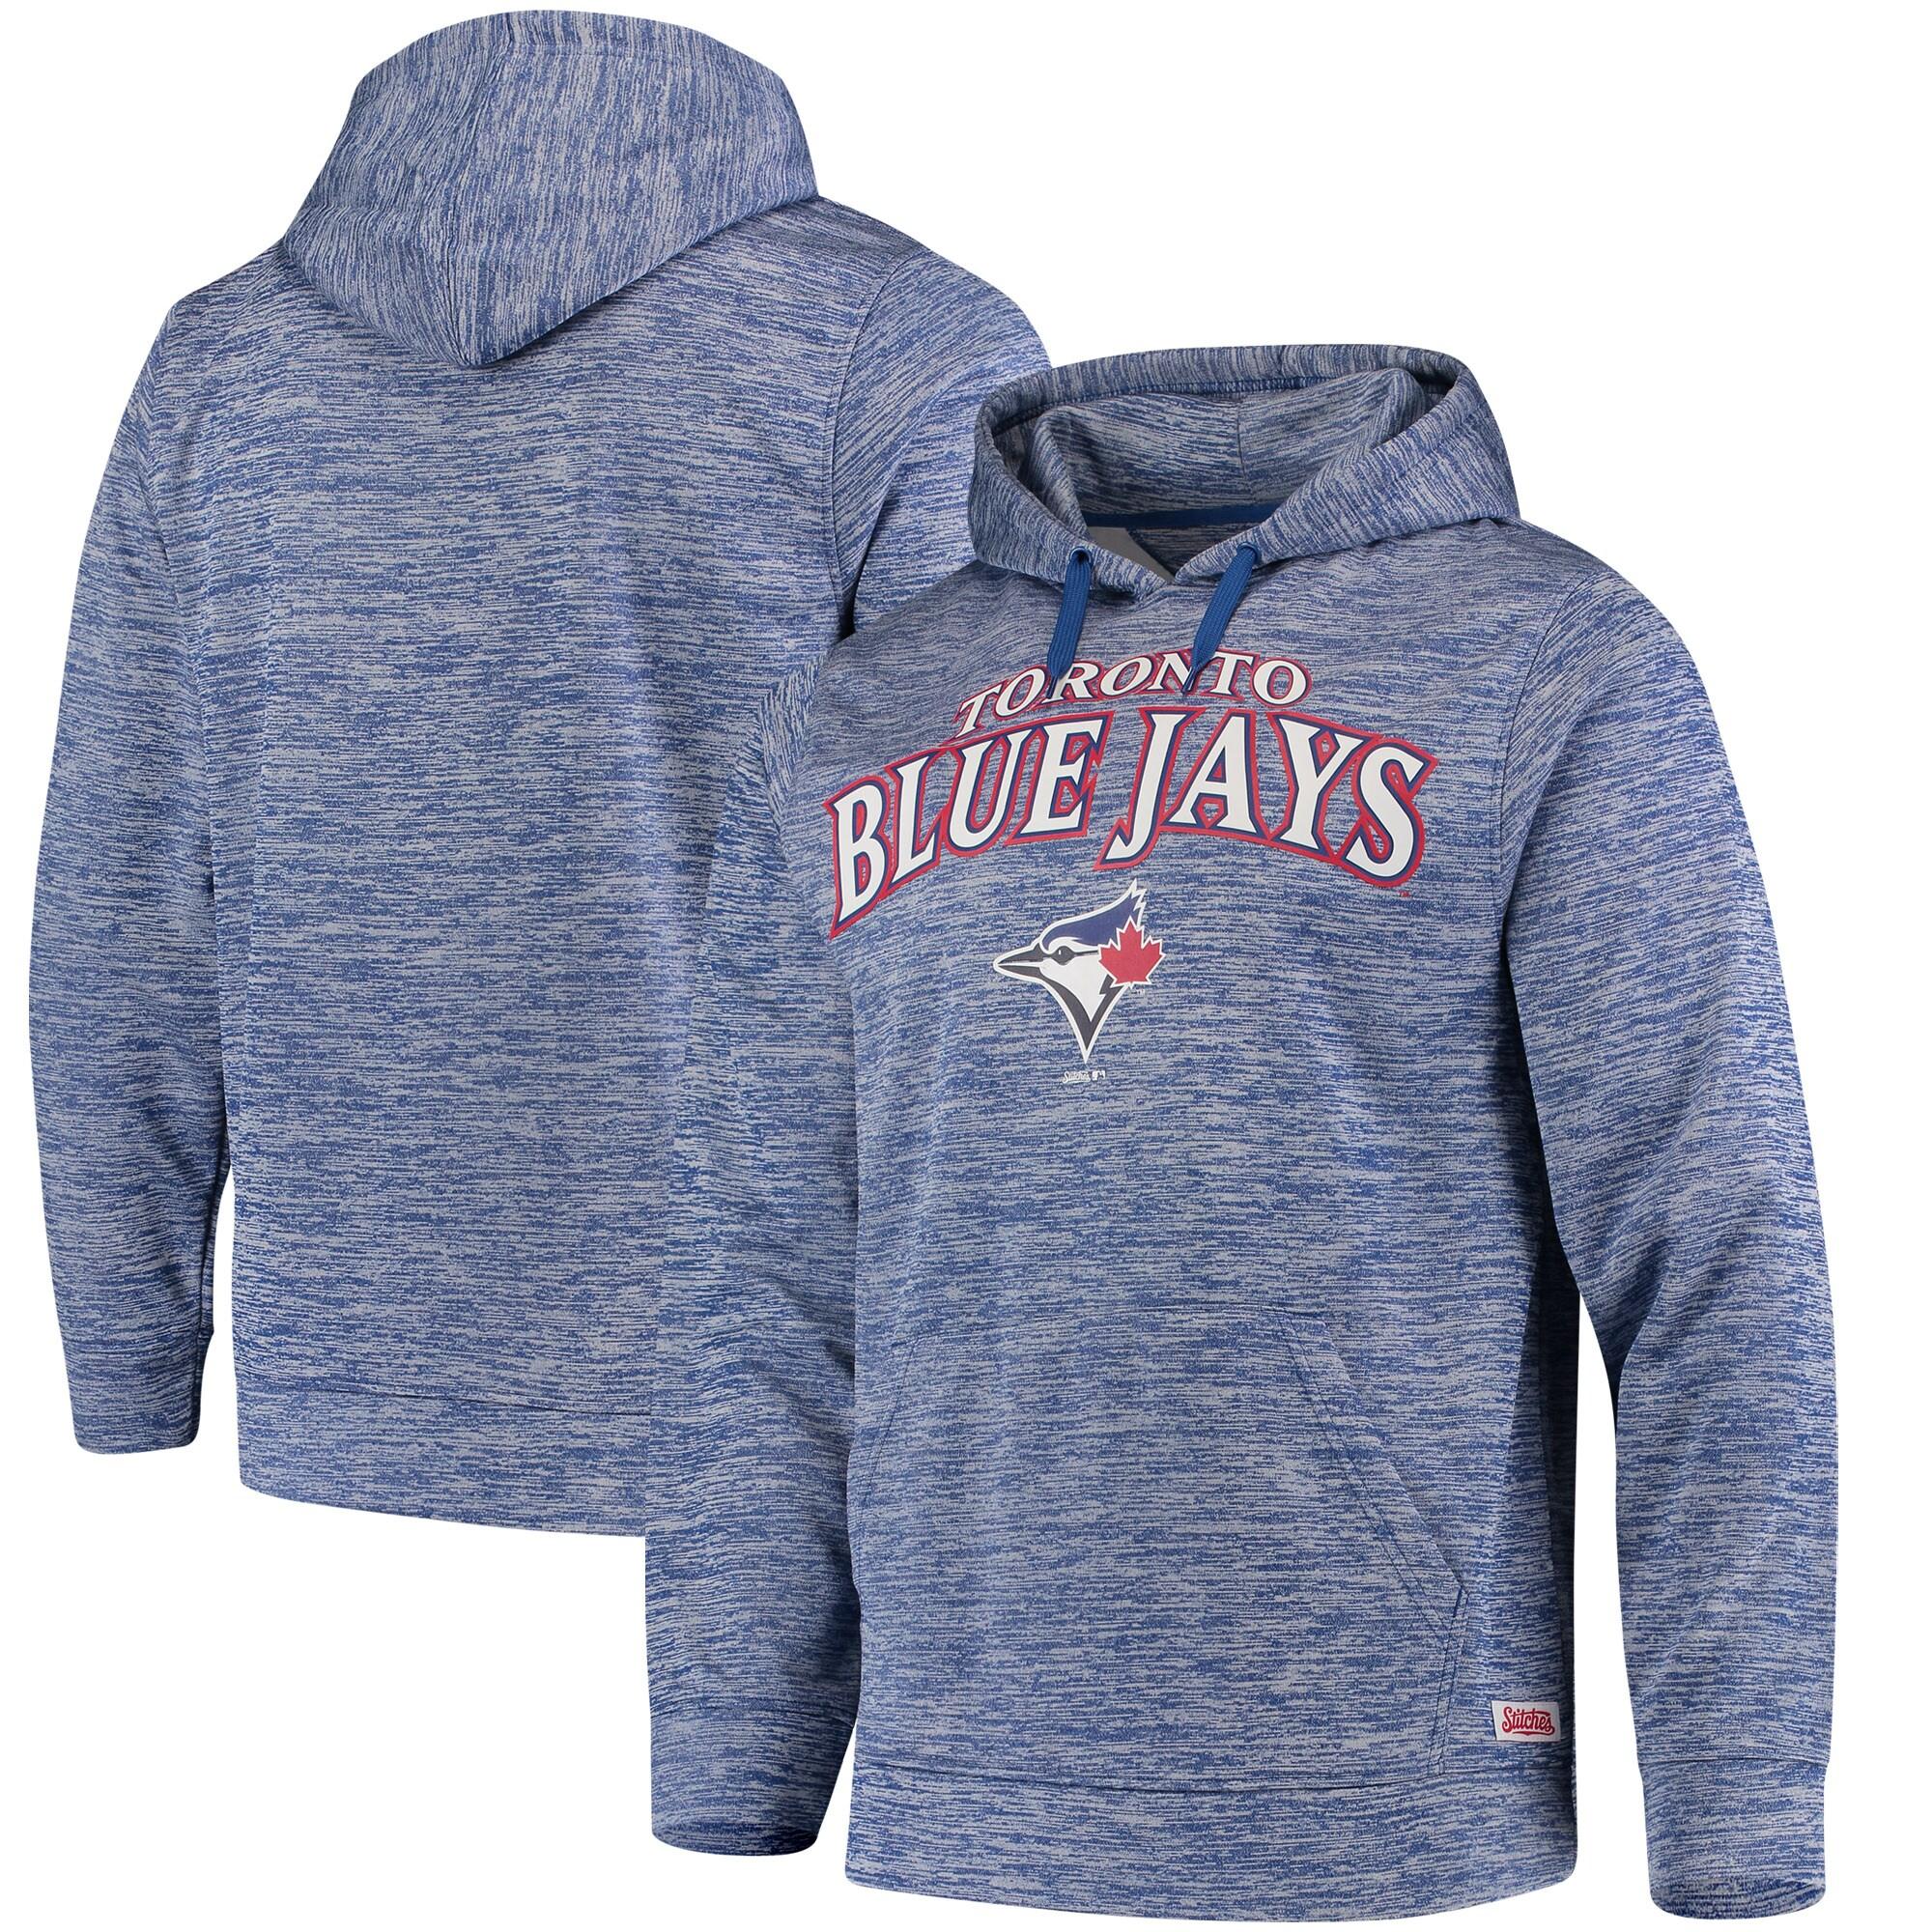 Toronto Blue Jays Stitches Digital Fleece Pullover Hoodie - Heathered Royal